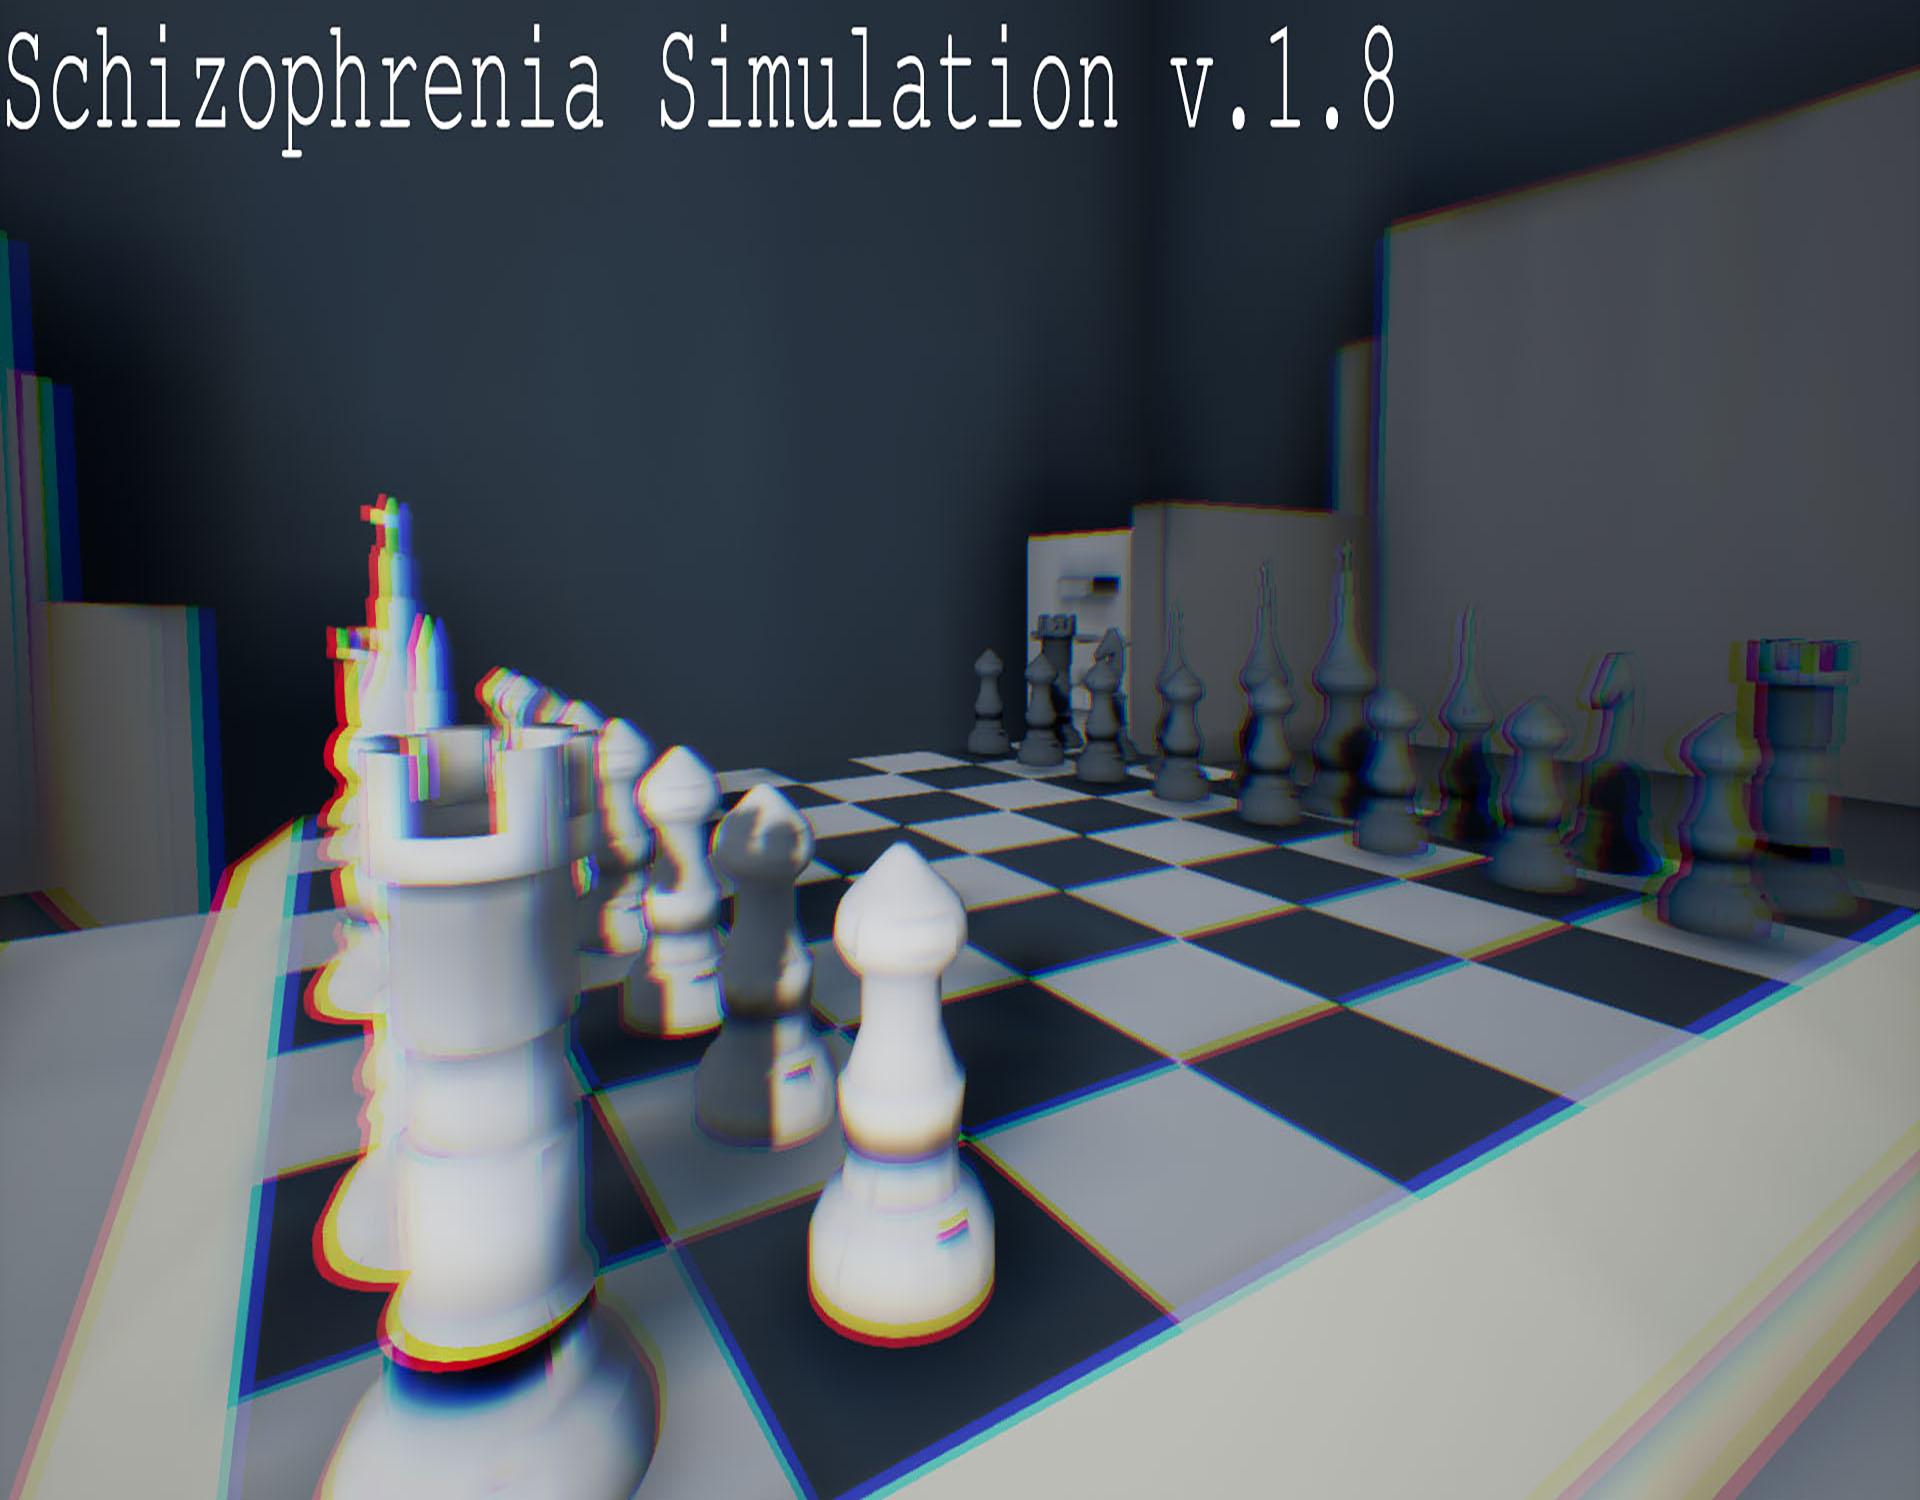 Schizophrenic Gamer